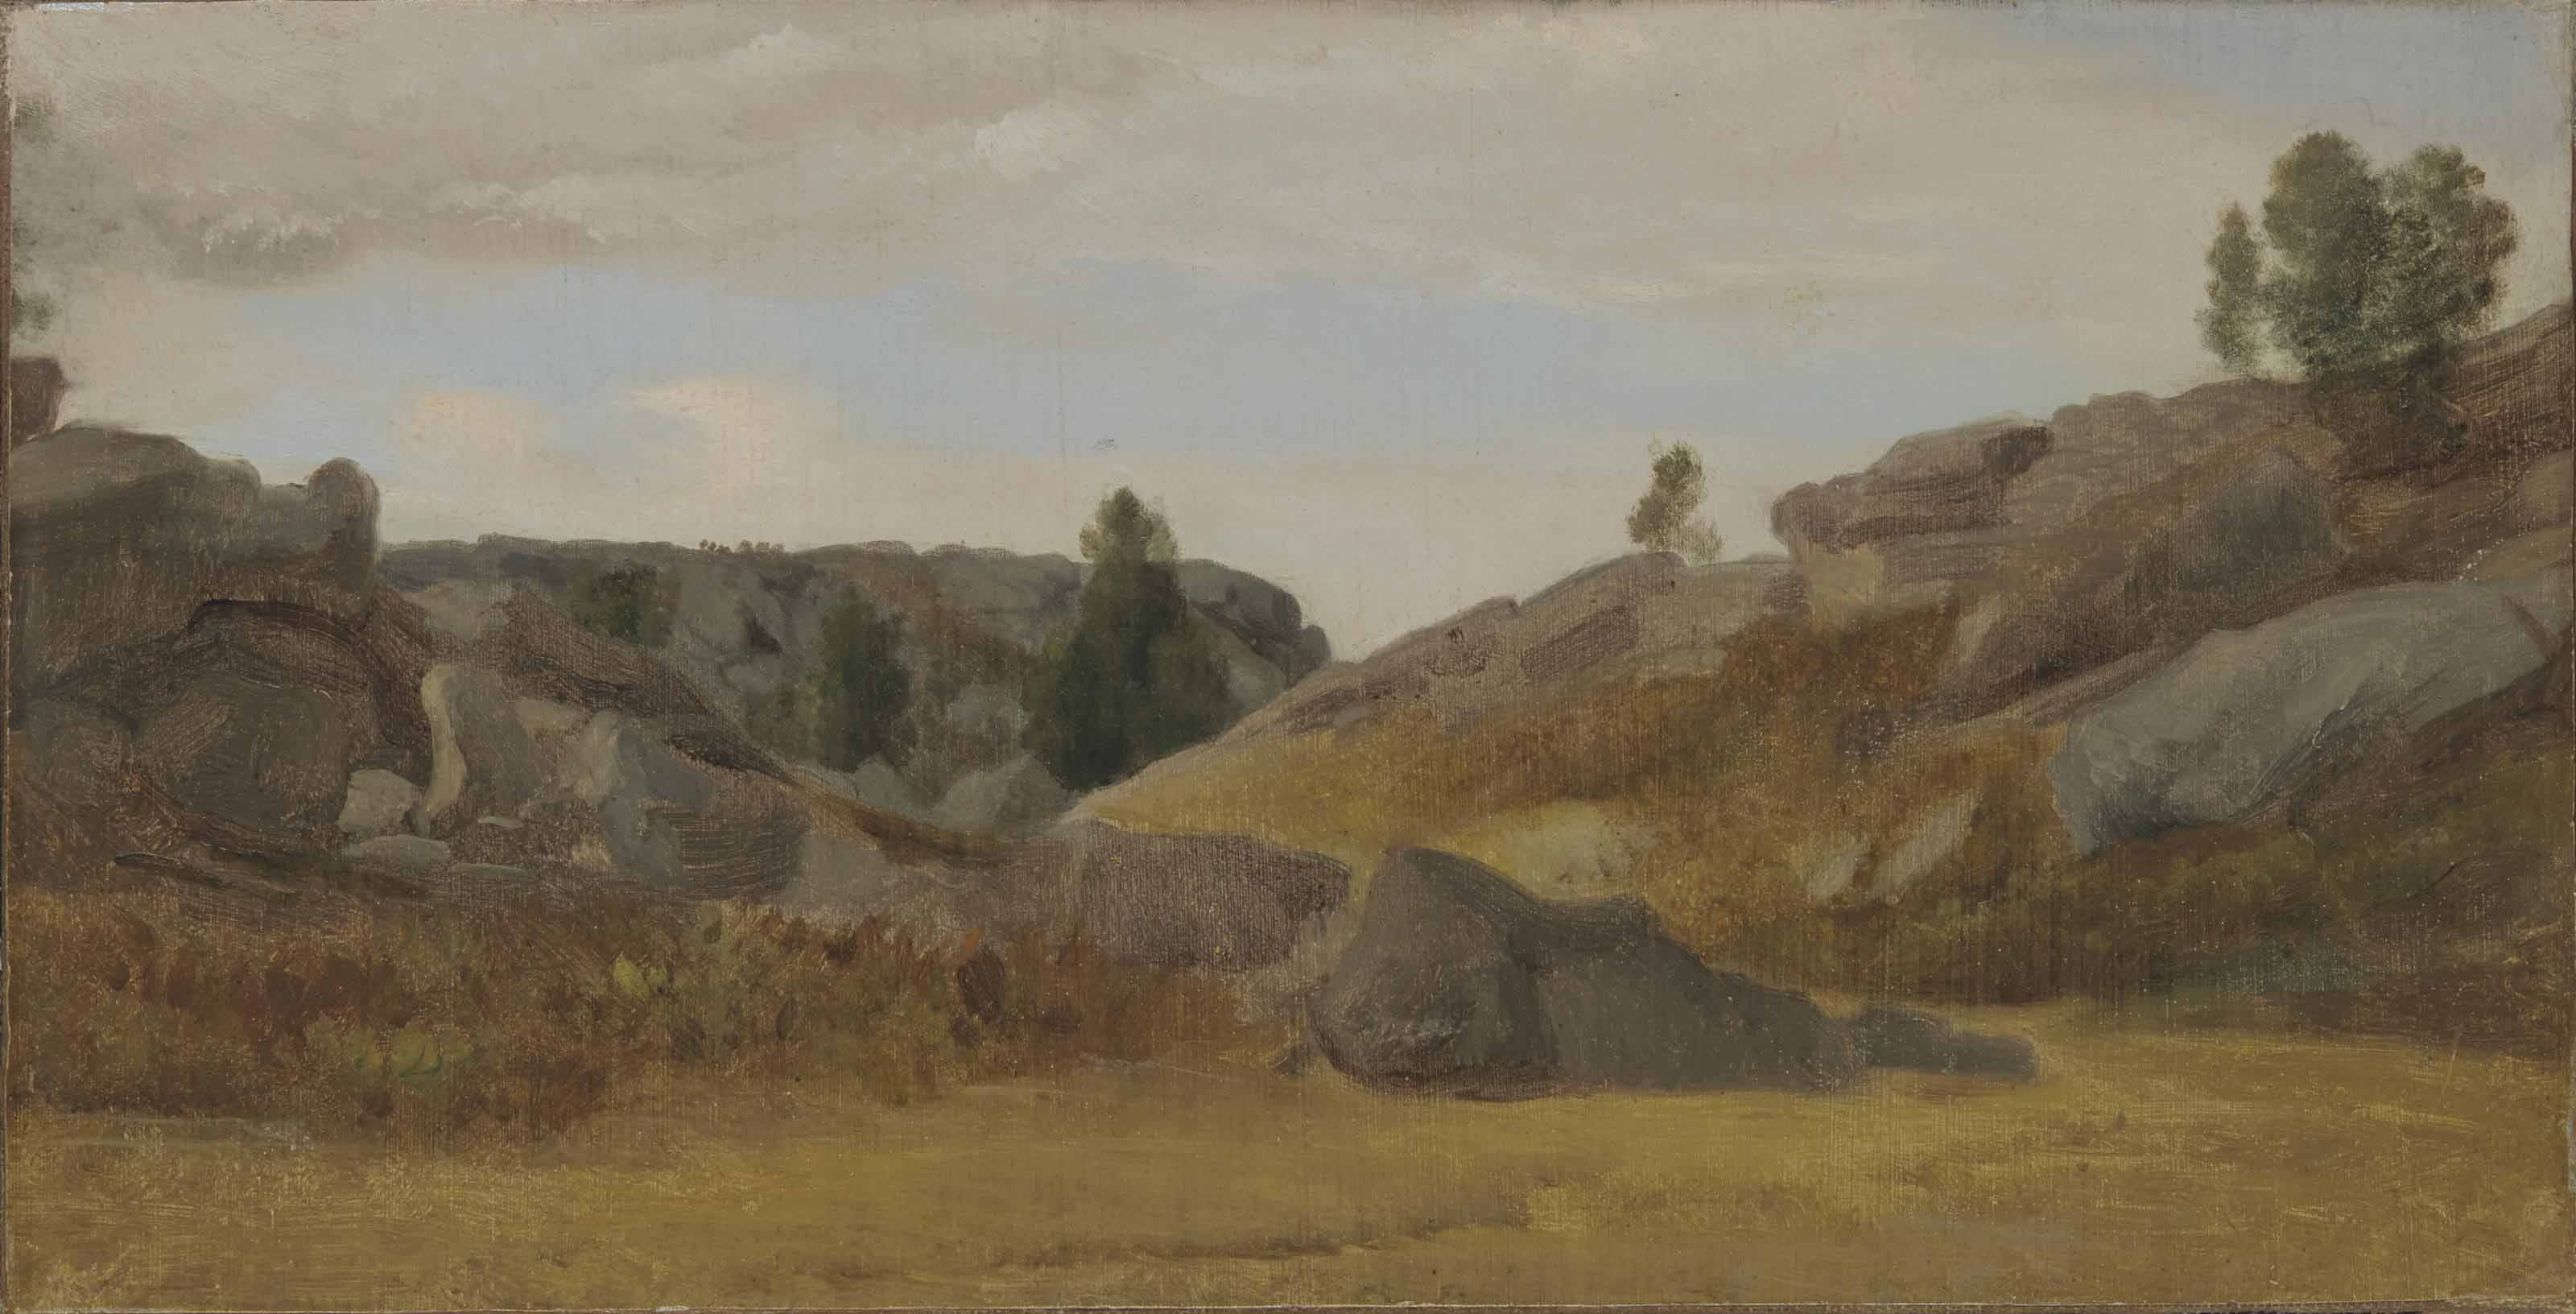 CLAUDE-FÉLIX-THÉODORE CARUELLE D'ALIGNY (CHAUMES 1798-1871 LYON)